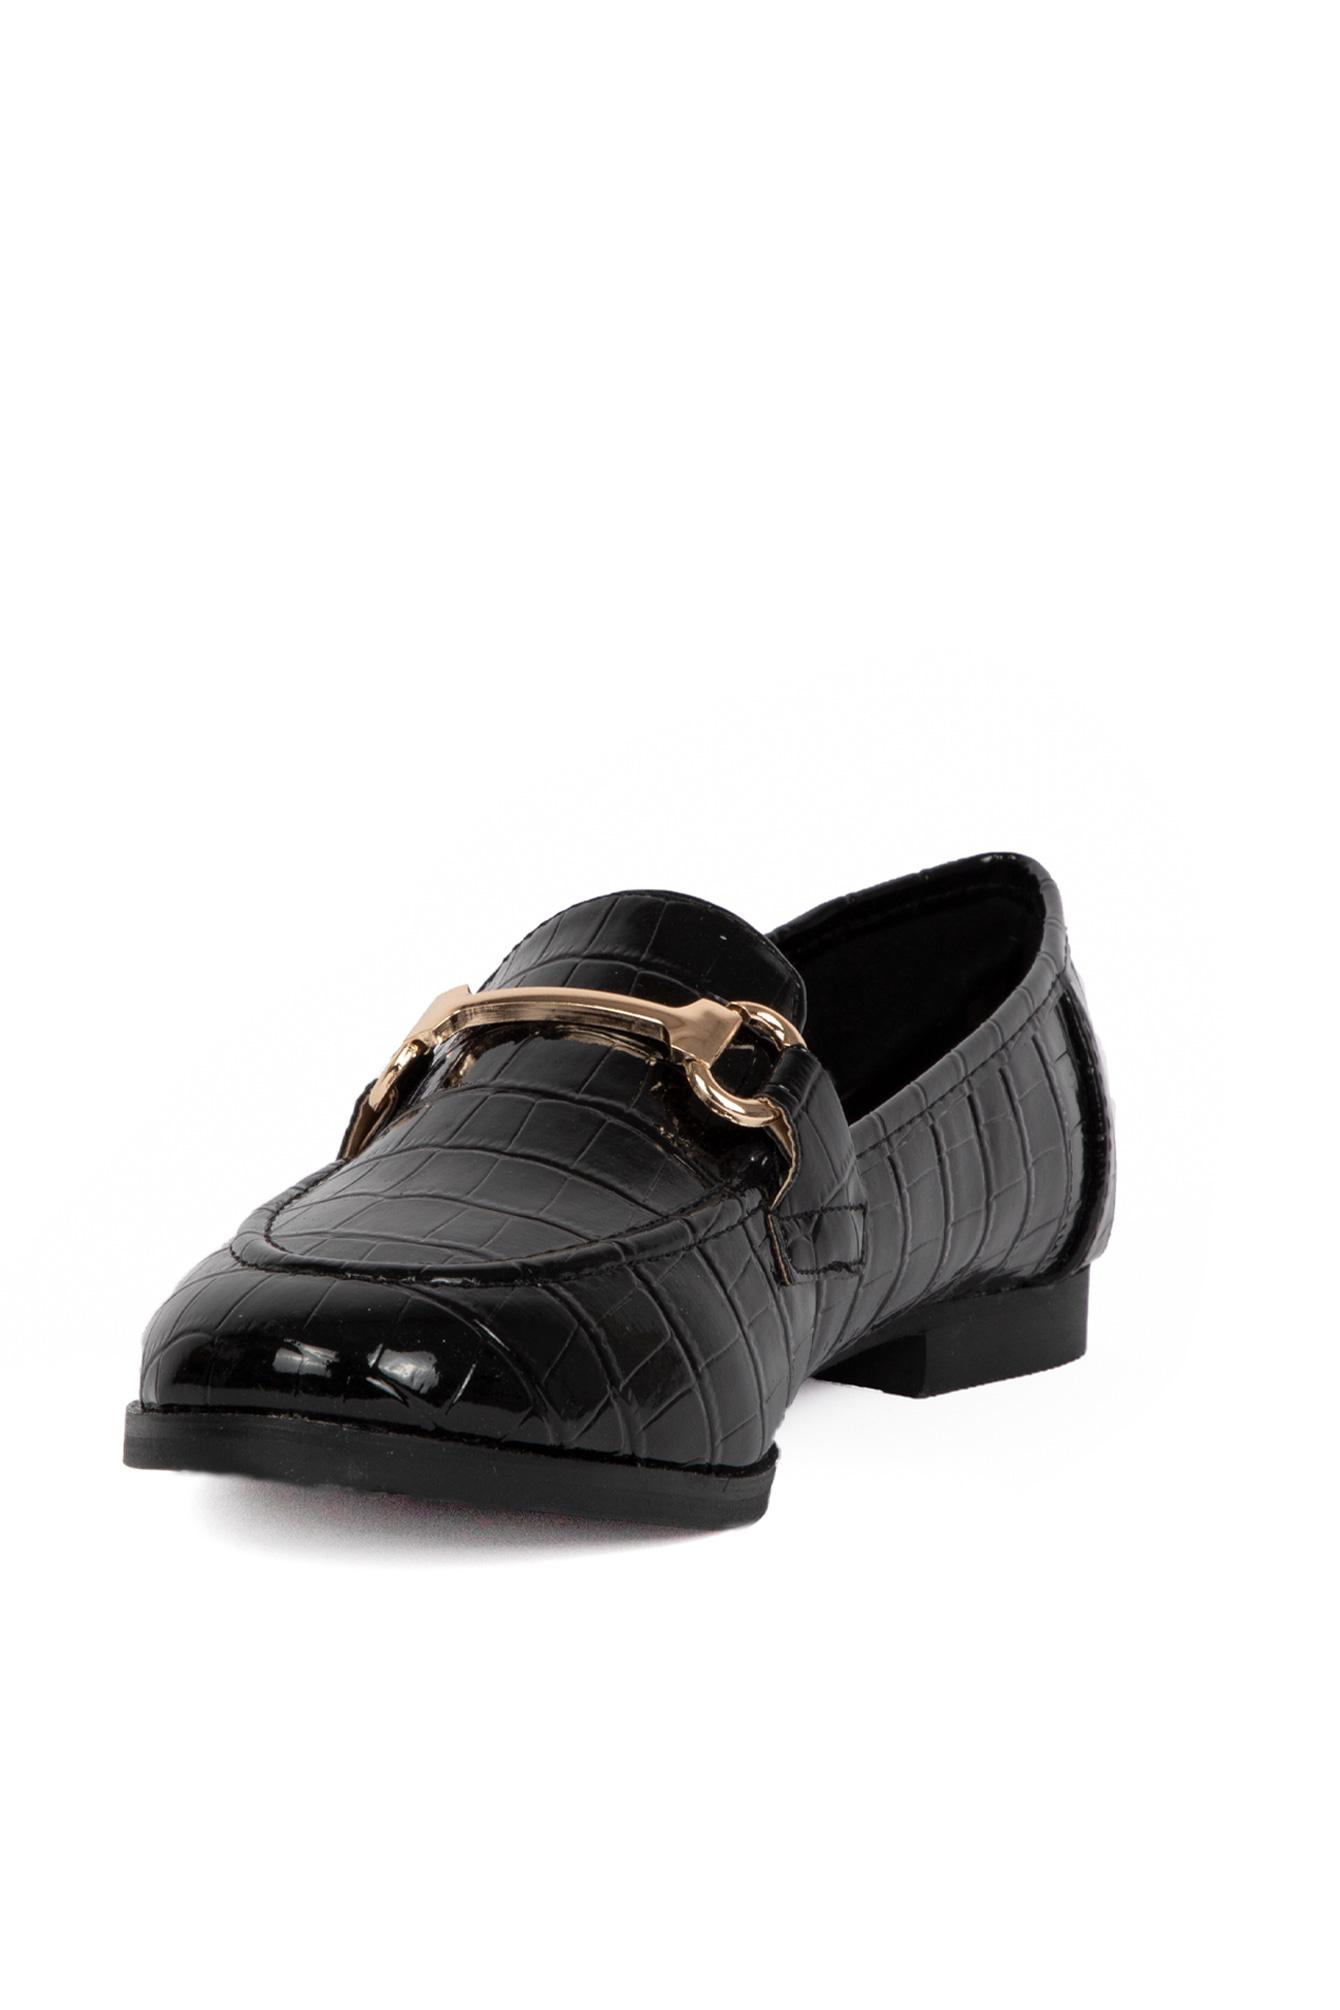 Black loafer croco